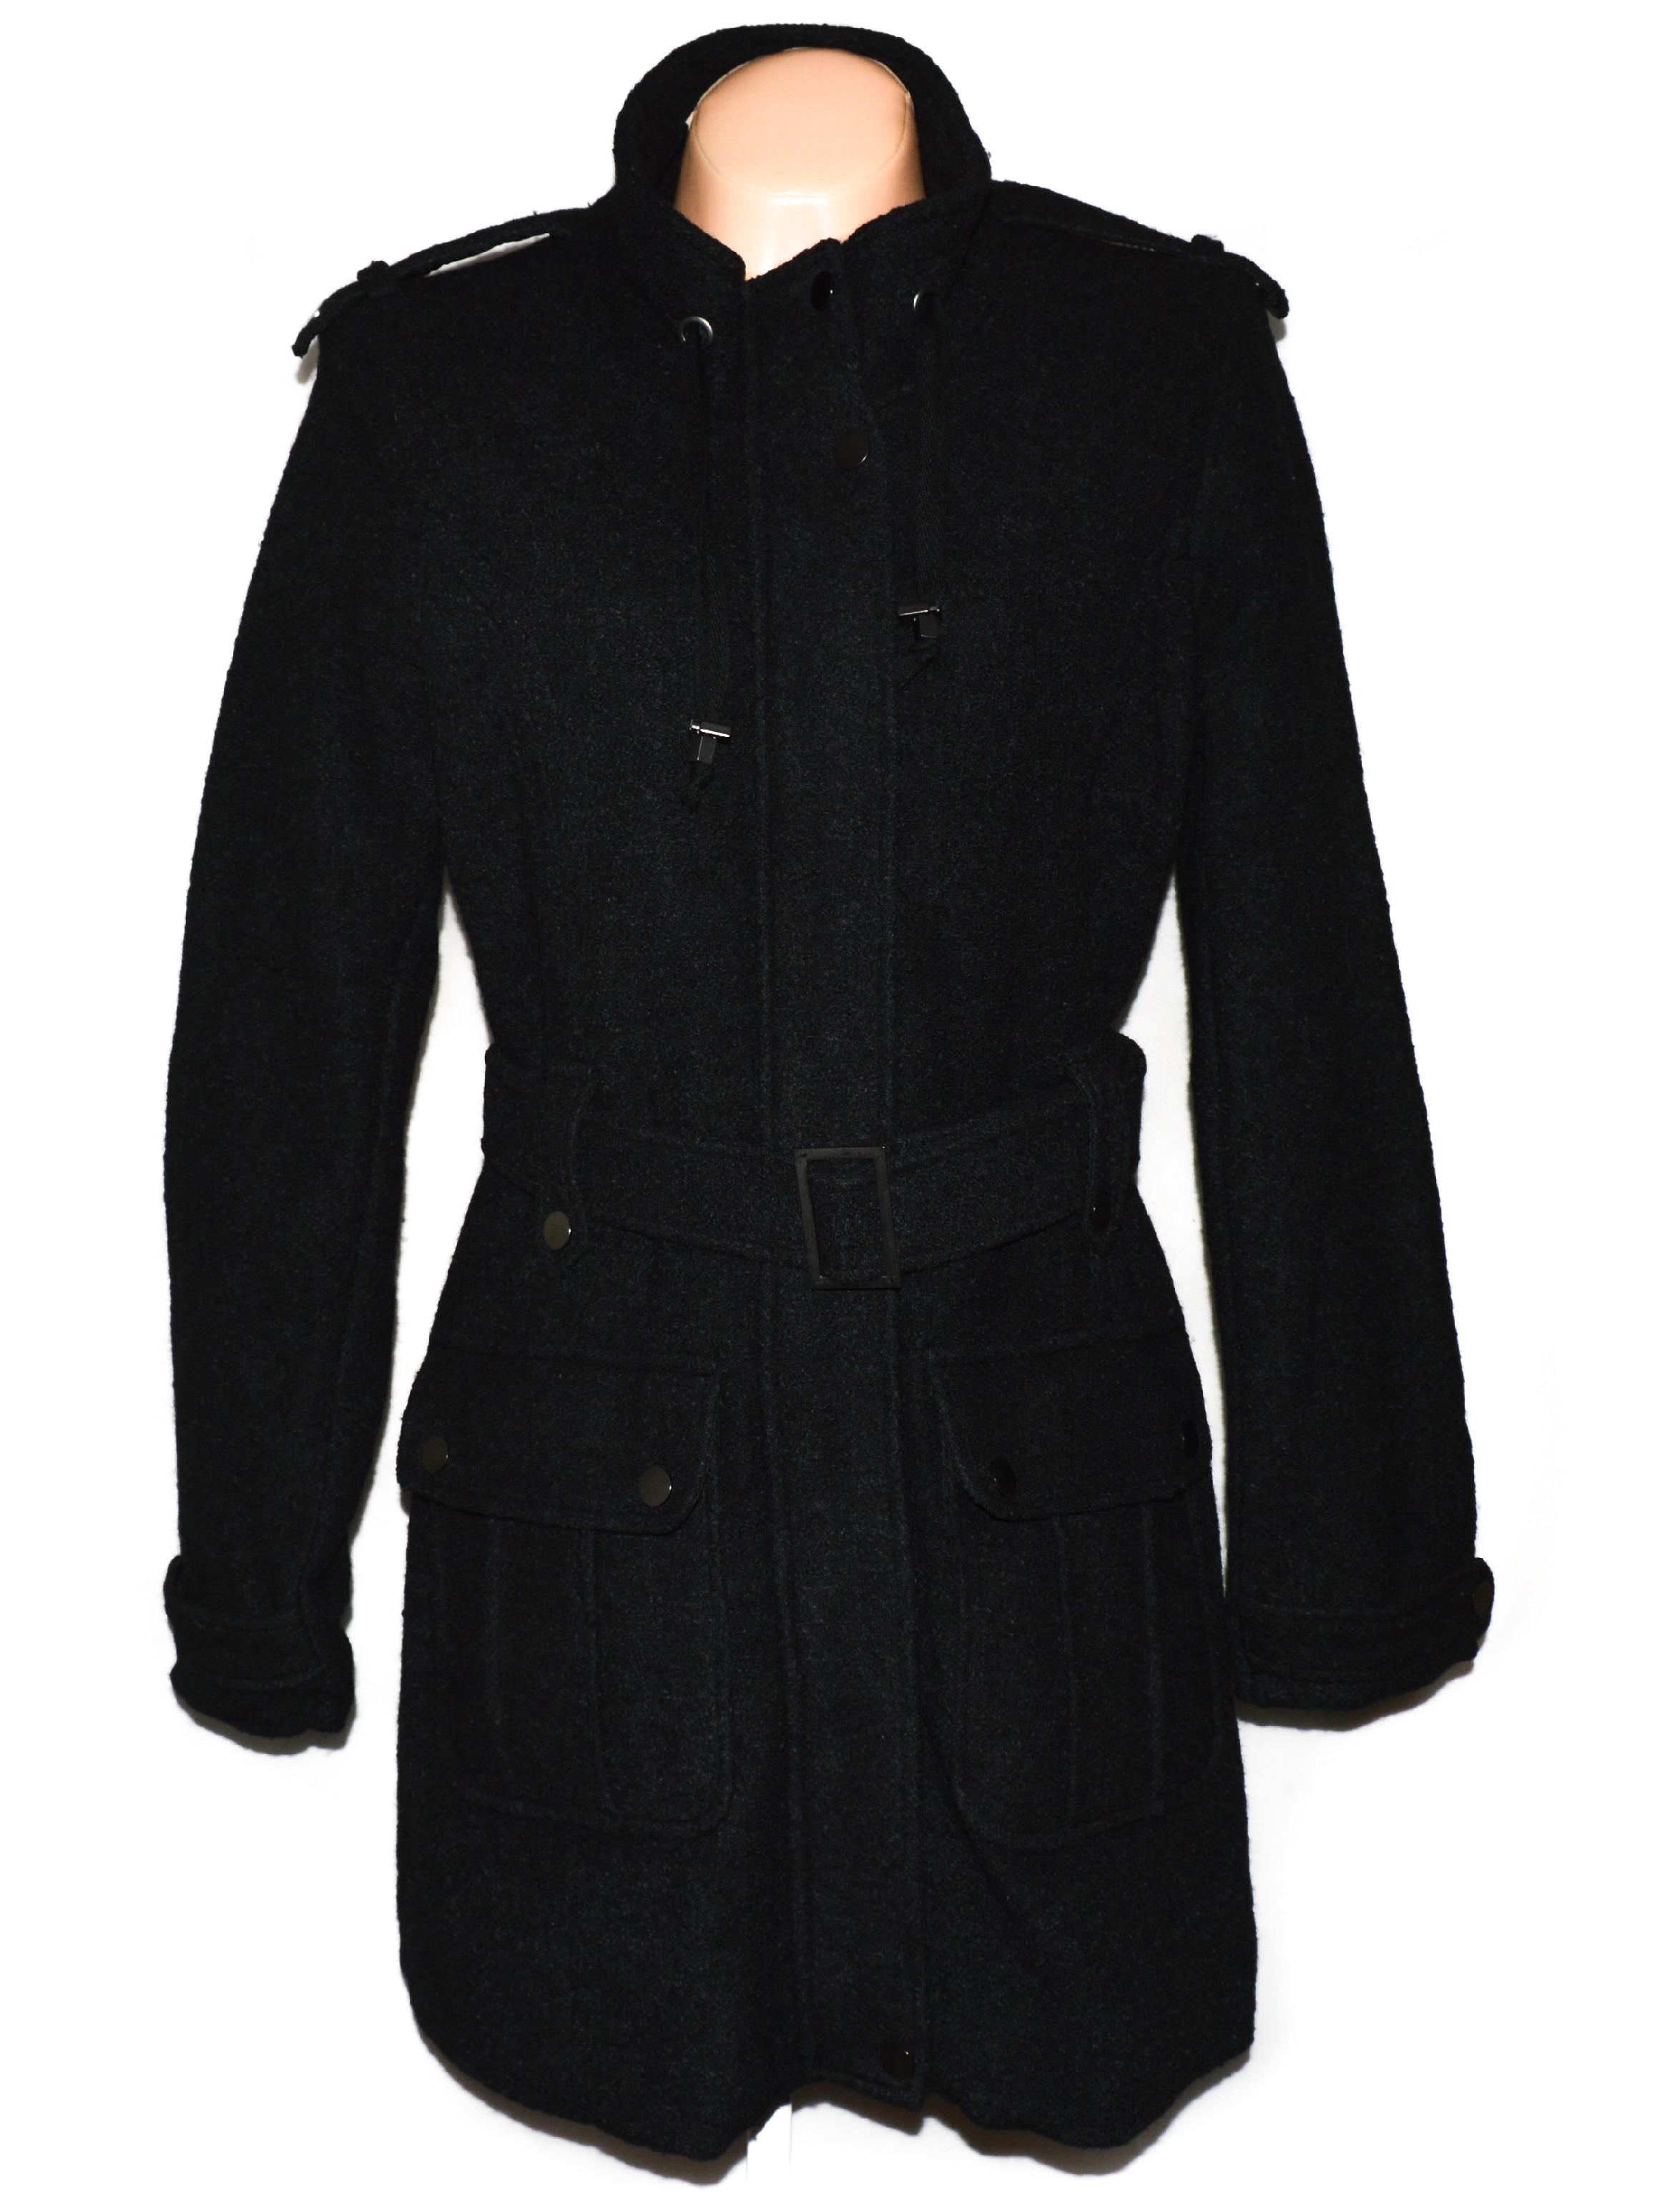 Dámský černý kabát s páskem Fransa XL